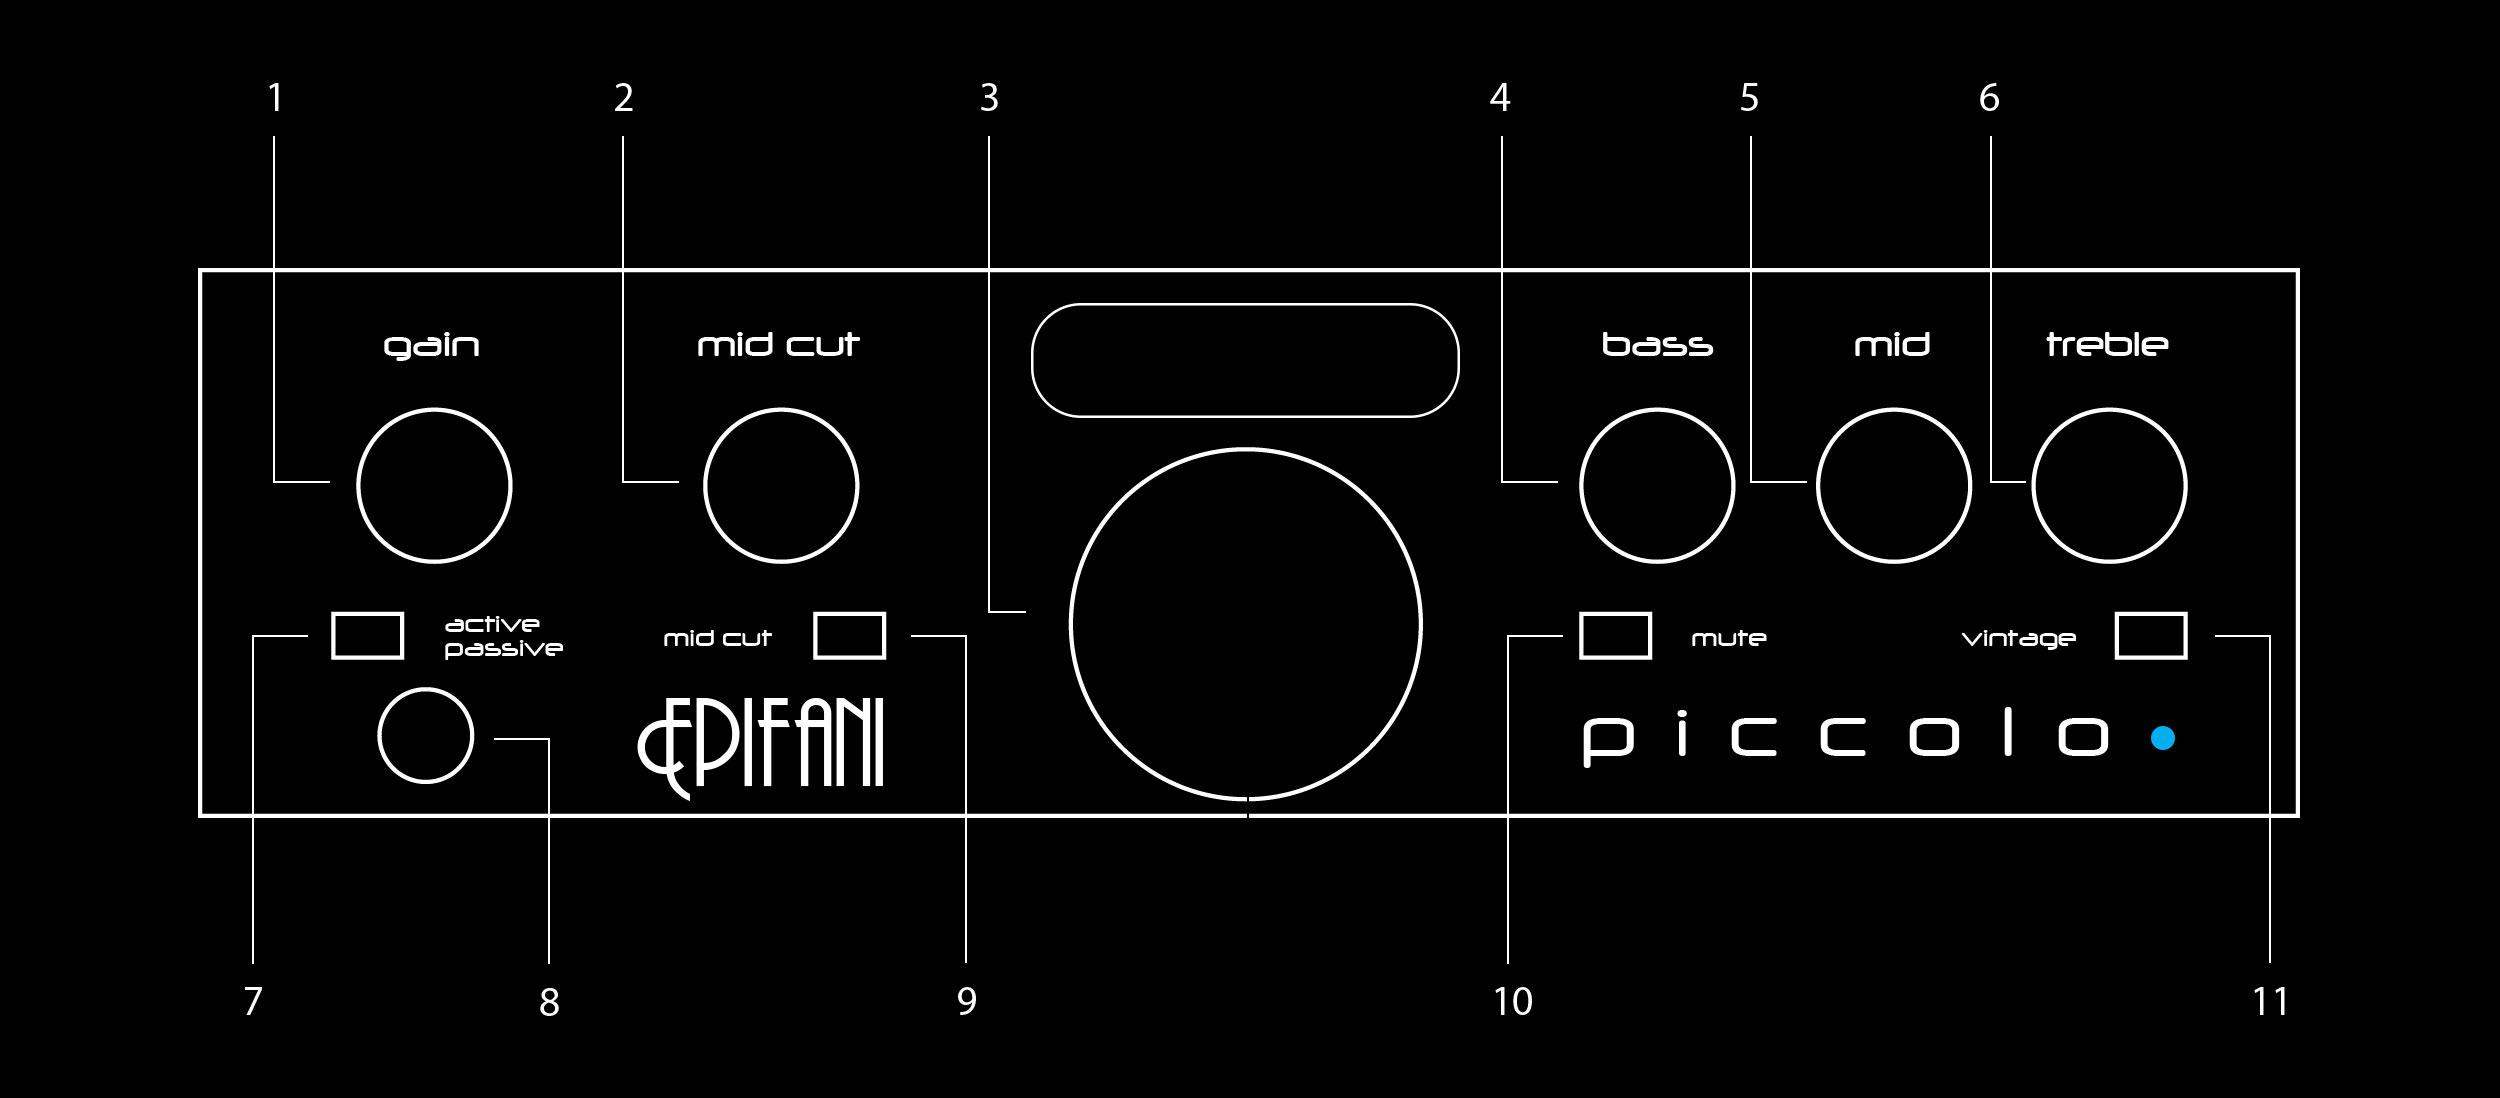 epifani-piccolo-front-diagram.jpg